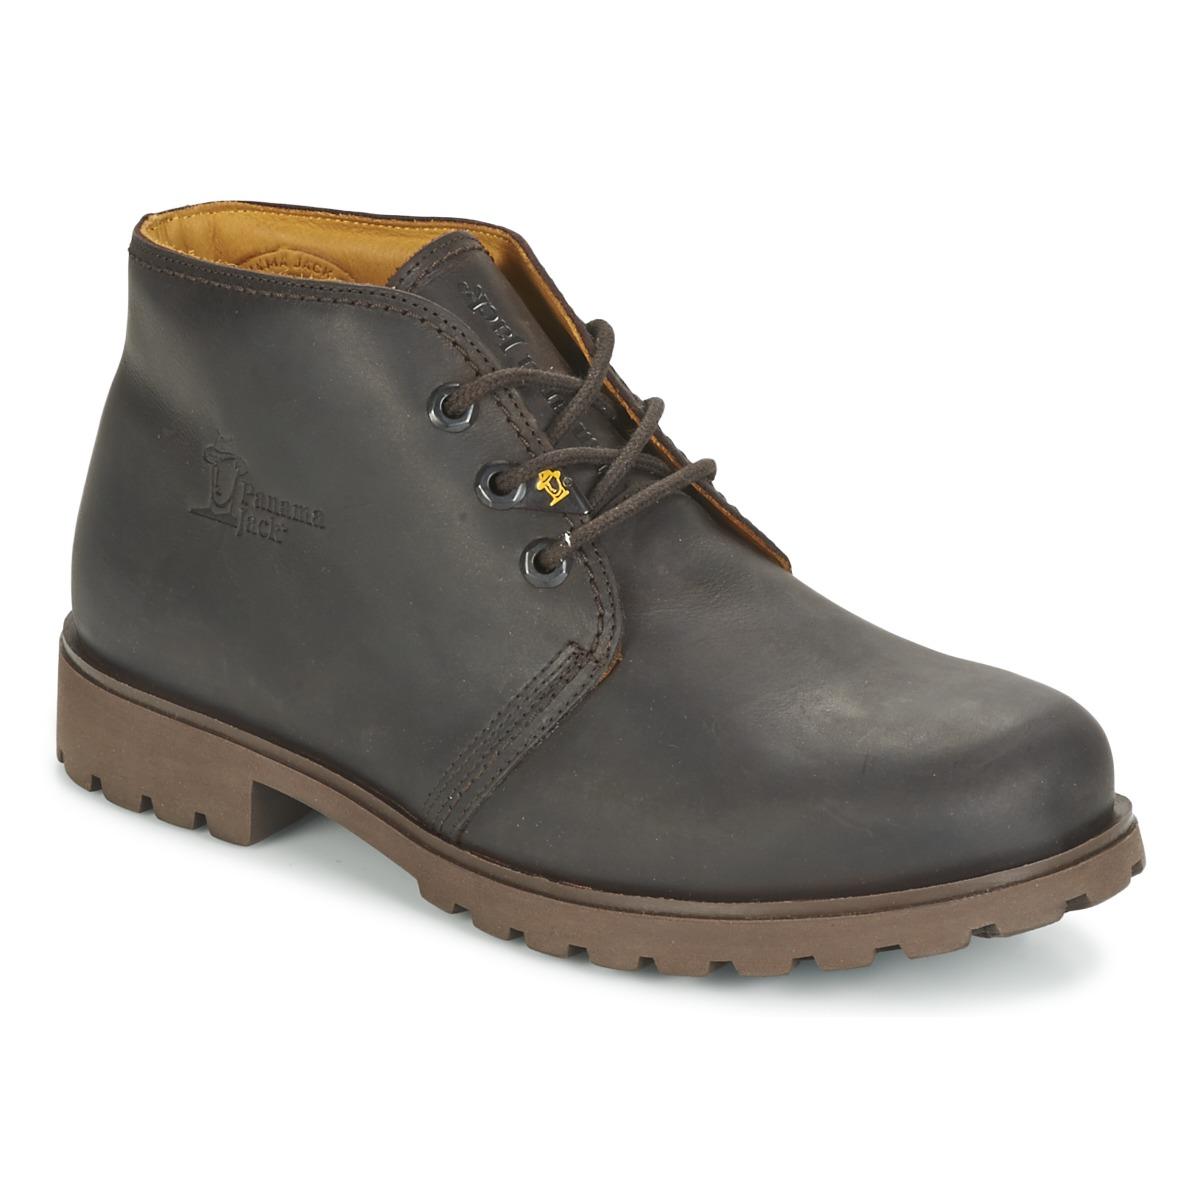 b83a598633326d Panama Jack BOTA PANAMA Brown Shoes Mid boots Men 30%OFF - www.b ...